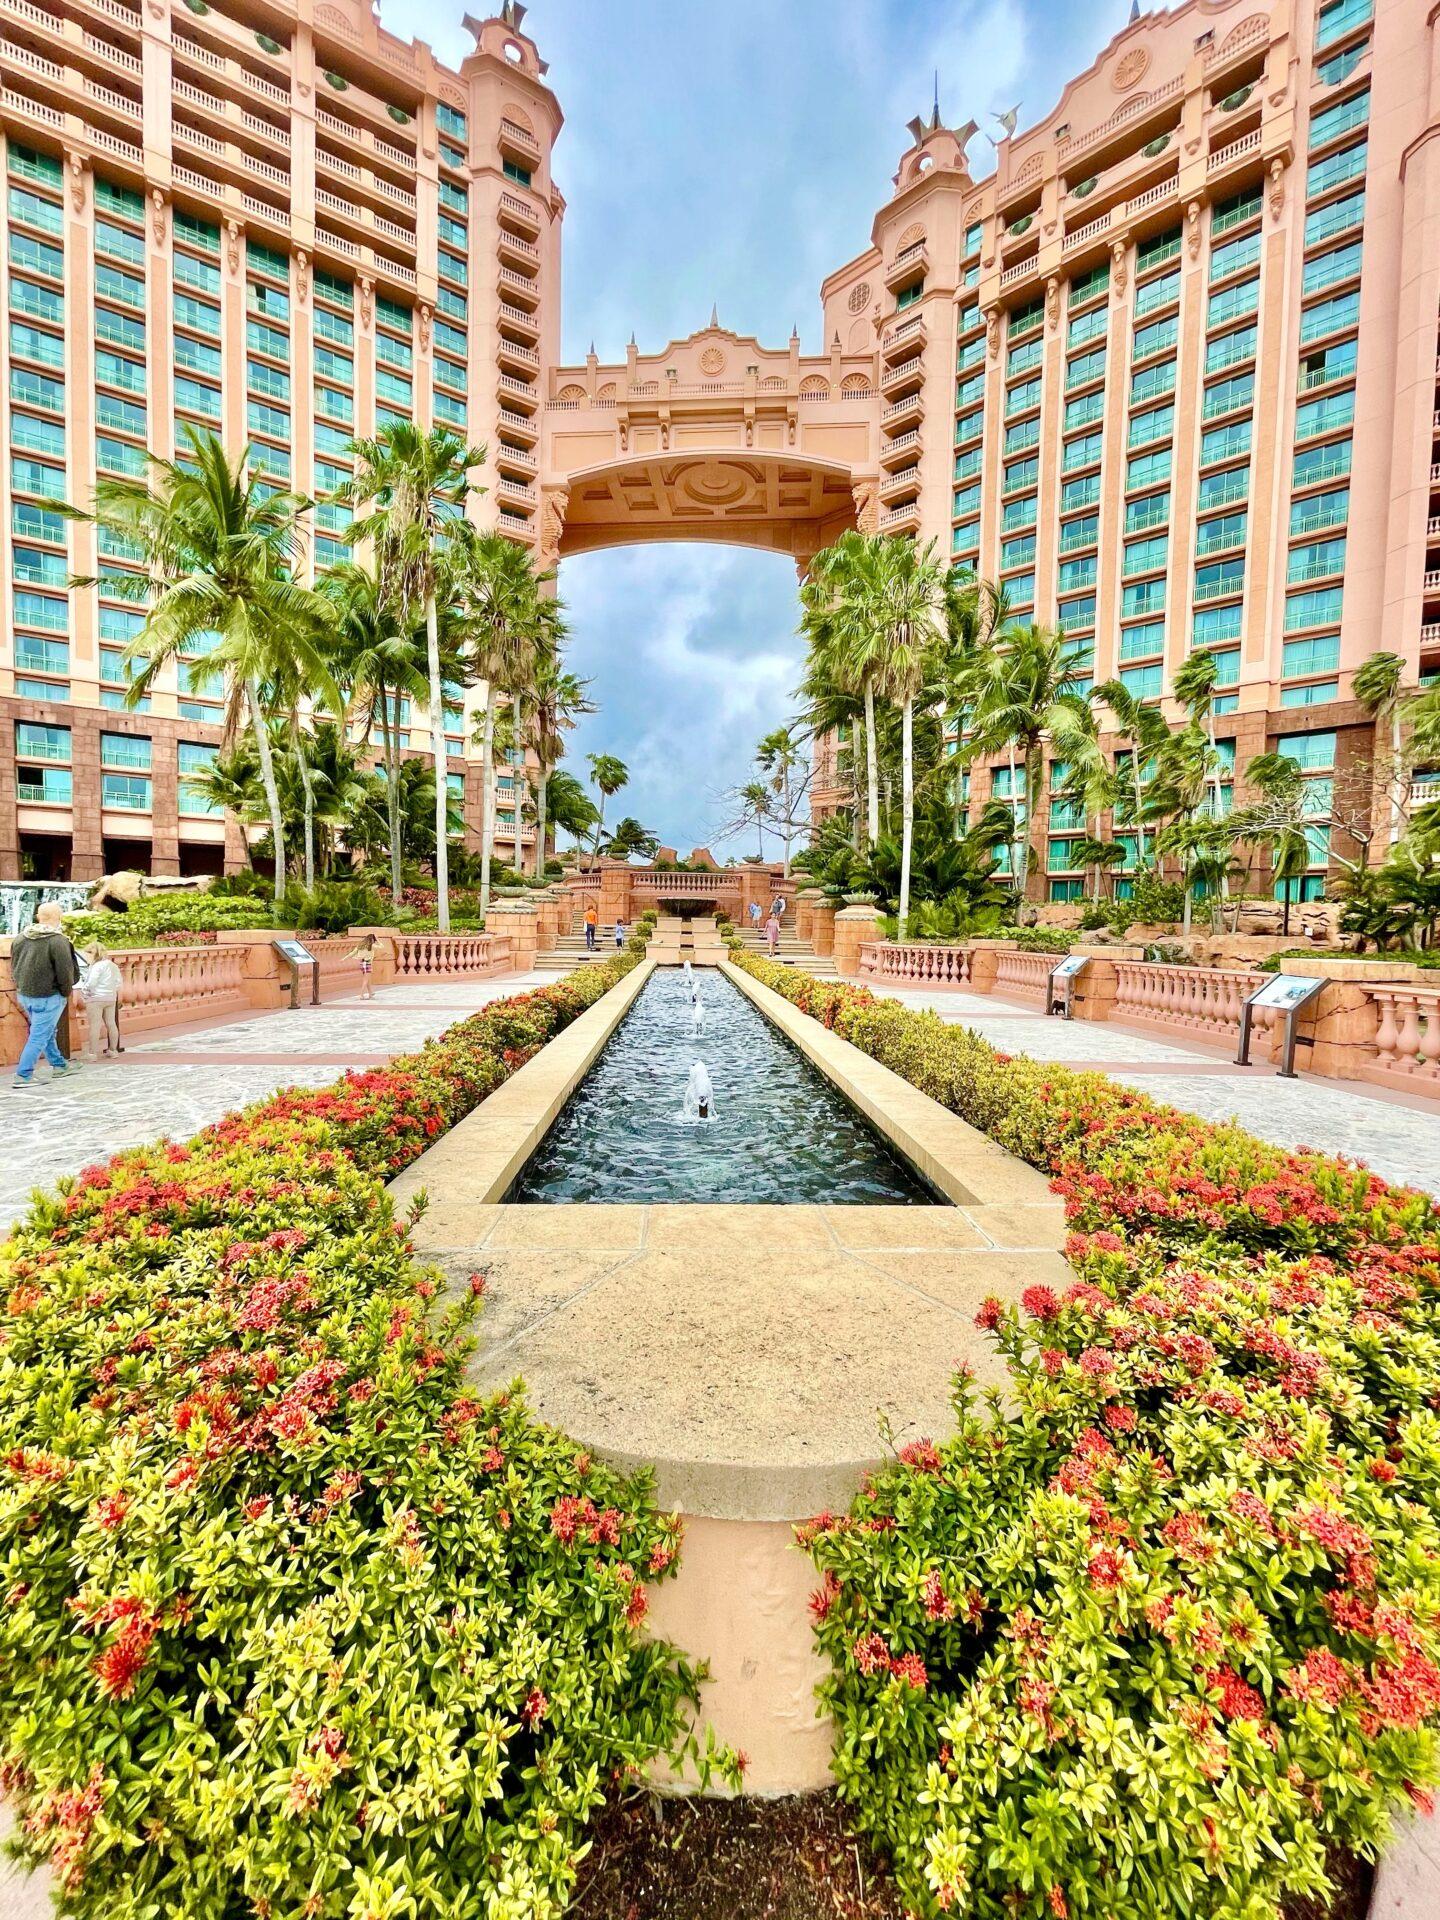 atlantis resort, atlantis bahamas, bahamas hotel, atlantis hotel, atlantis hotel review, atlantis review, review of atlantis